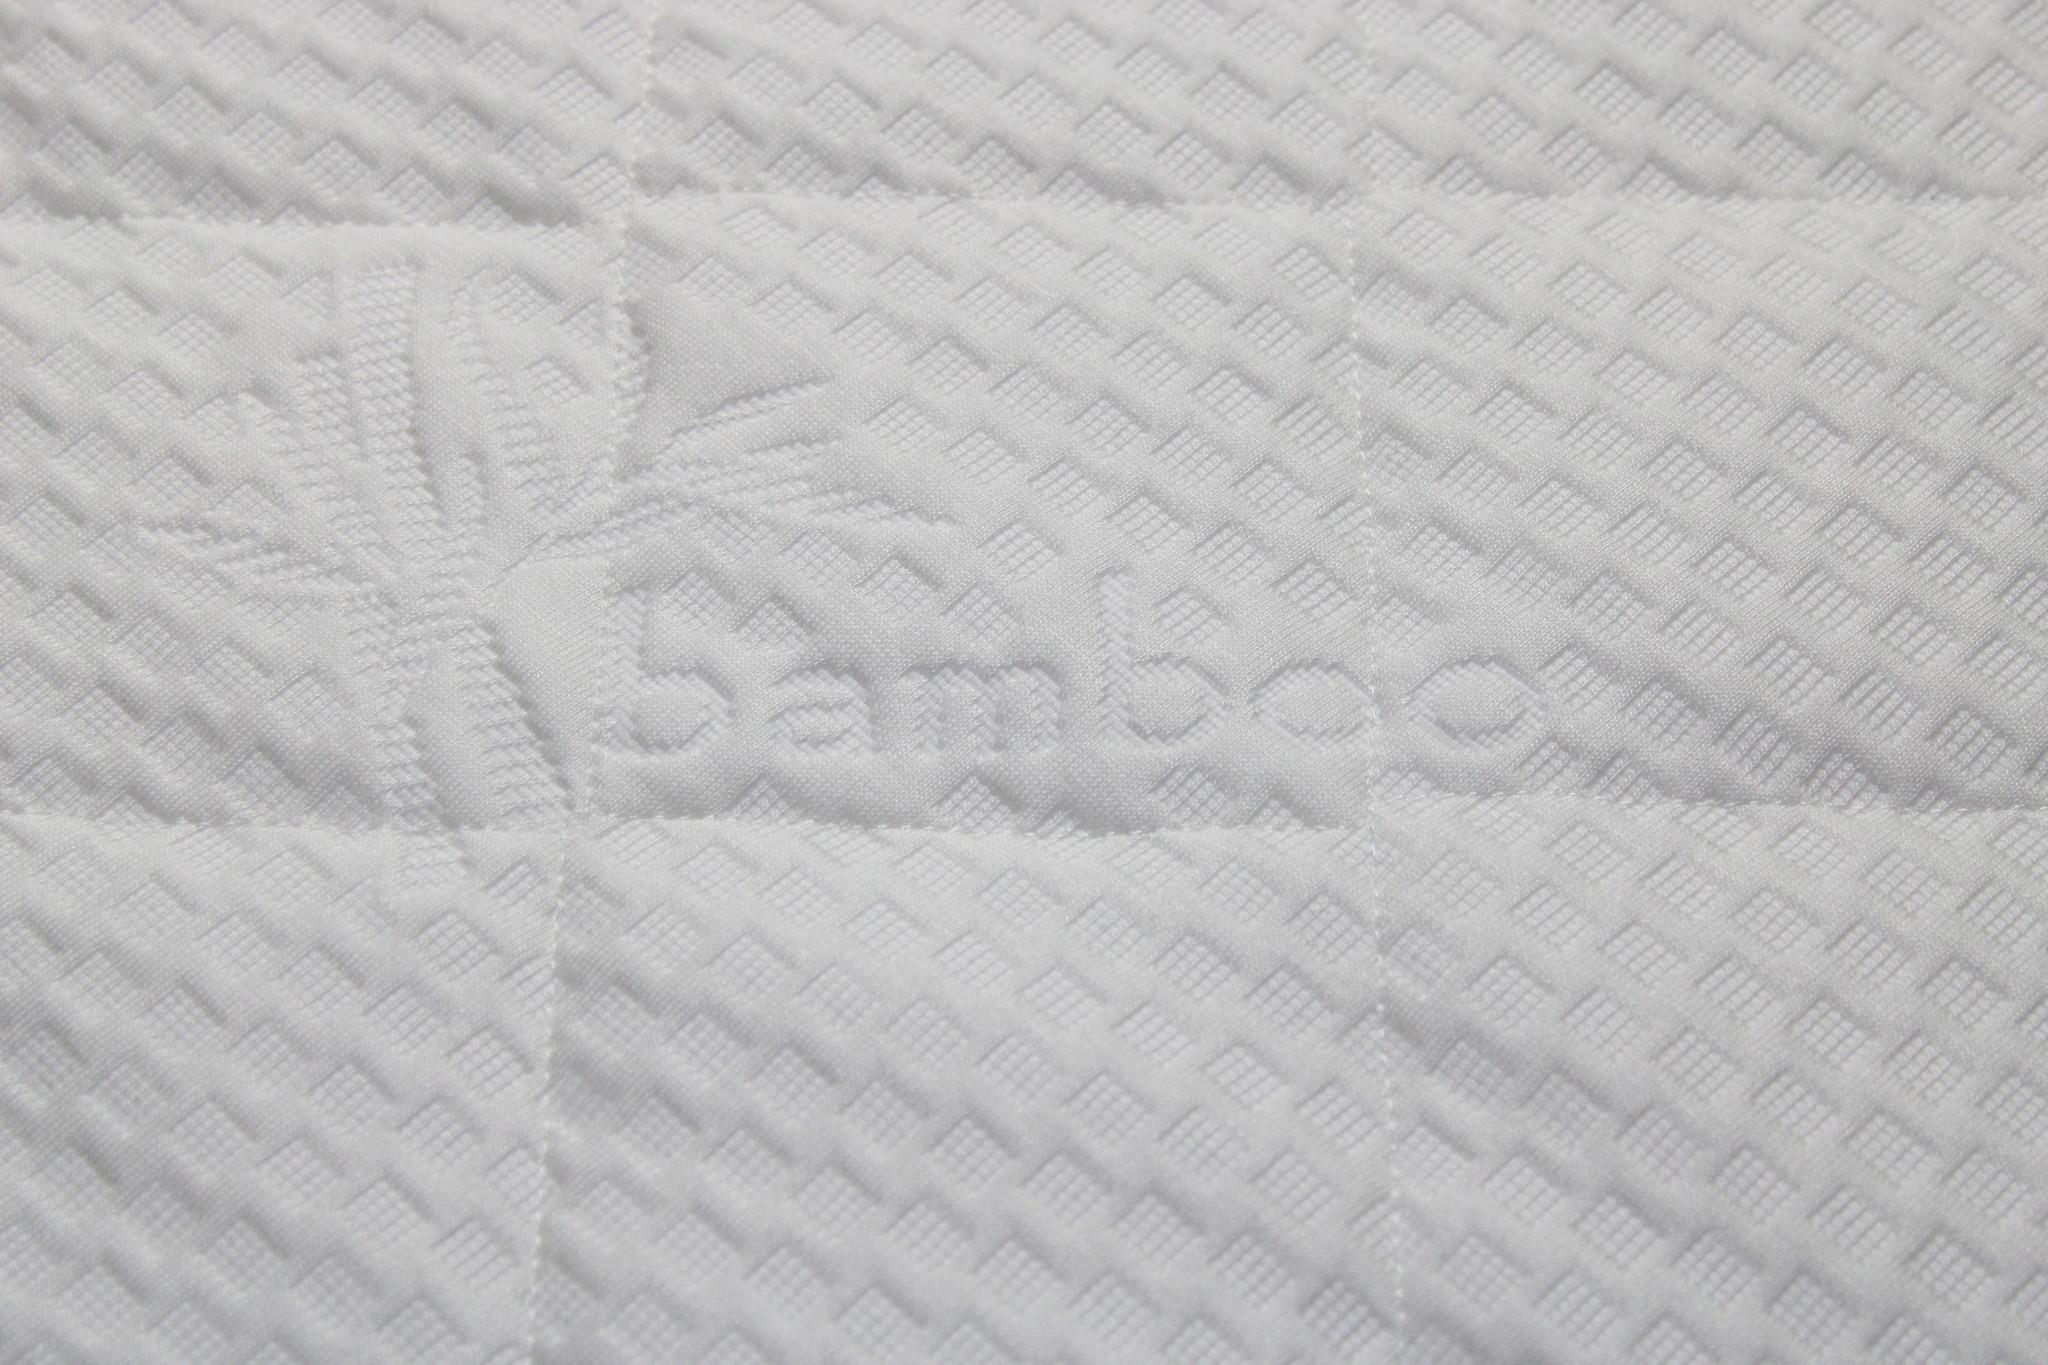 Sarpy Kindermatras 80x160 koudschuim HR55 bamboo